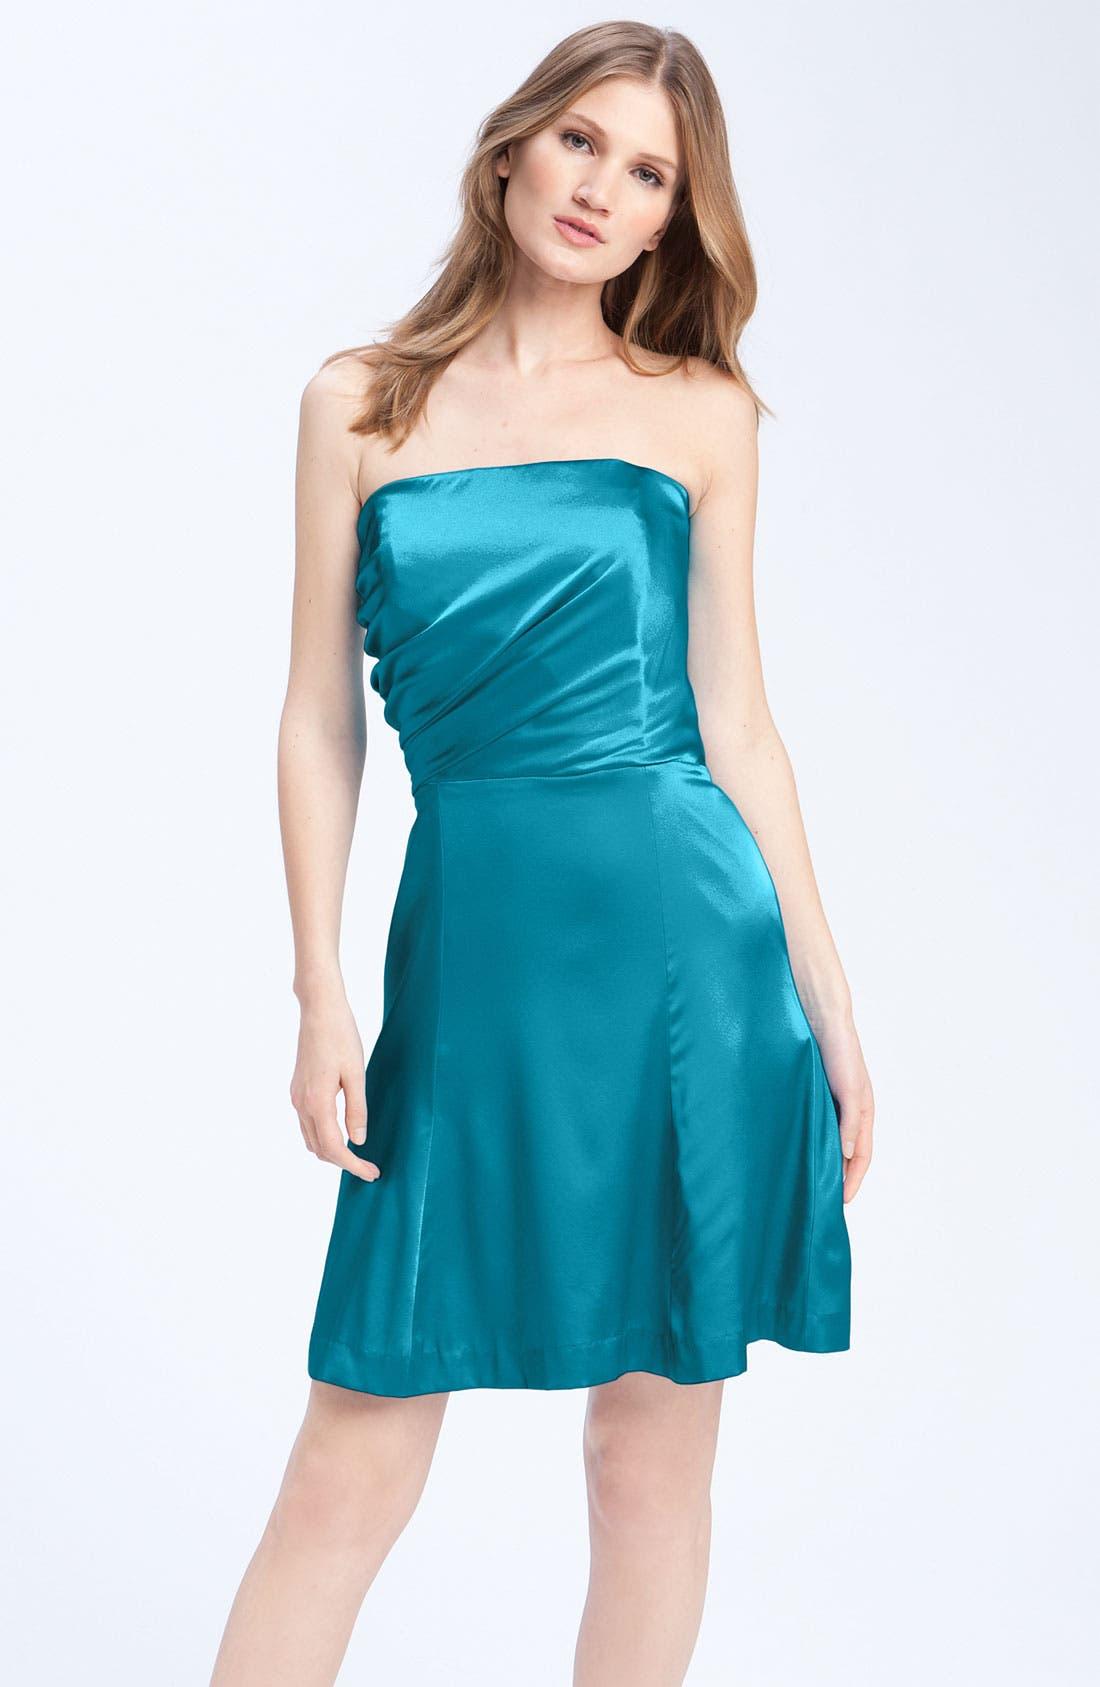 Main Image - Anna Elyse Bridesmaids Strapless Charmeuse Dress